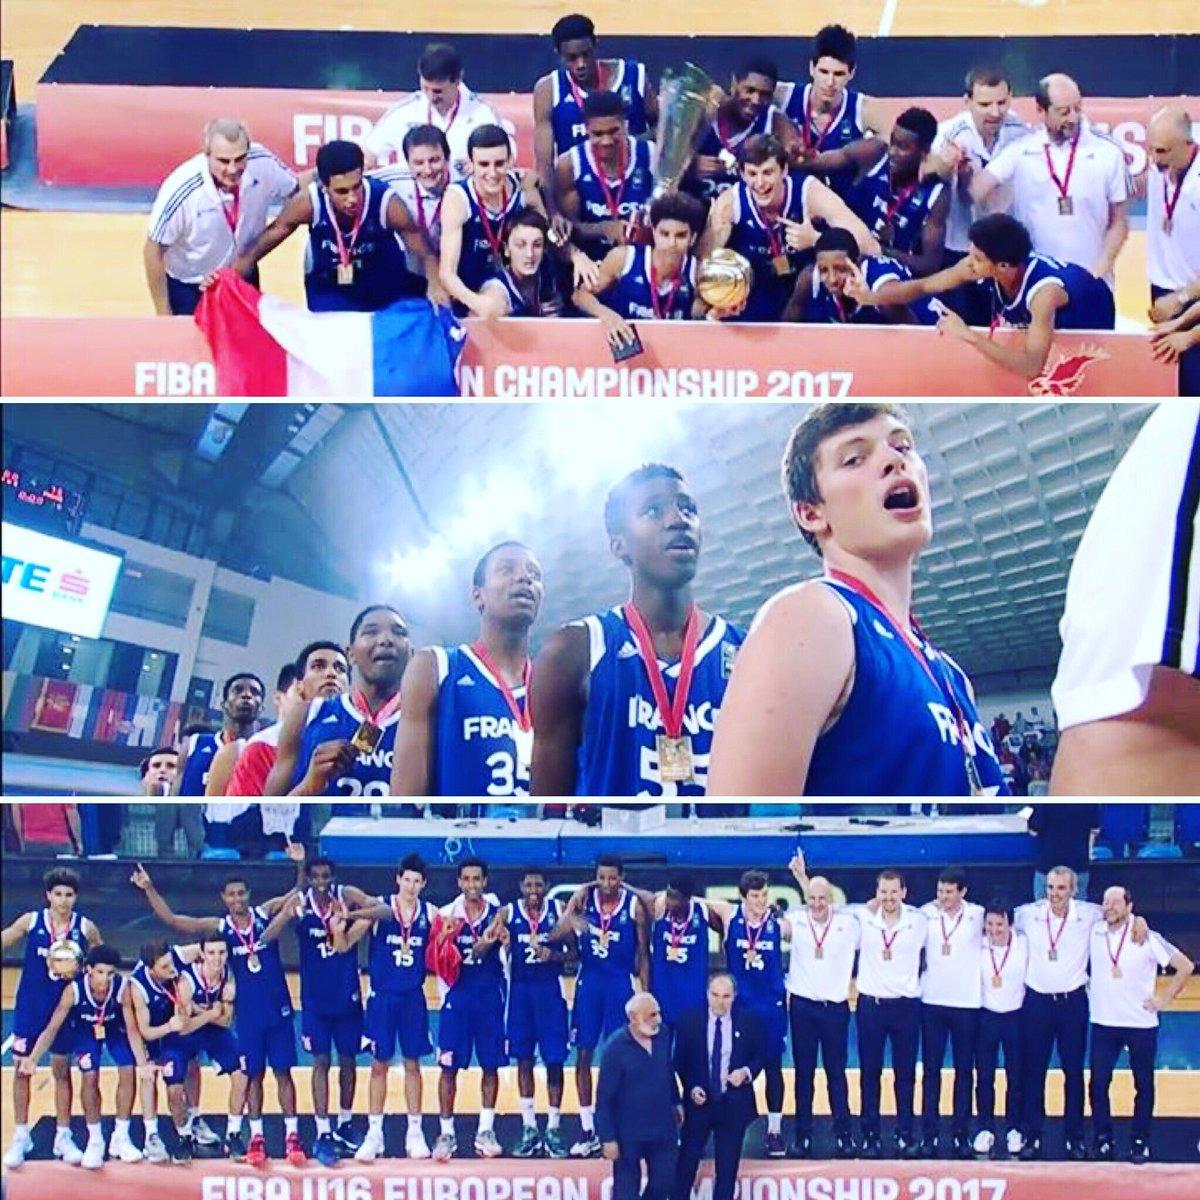 Les Champions d'Europe   #FIBAU16Europe #AvenirPrometteurpic.twitter.com/63nL4YAJjI